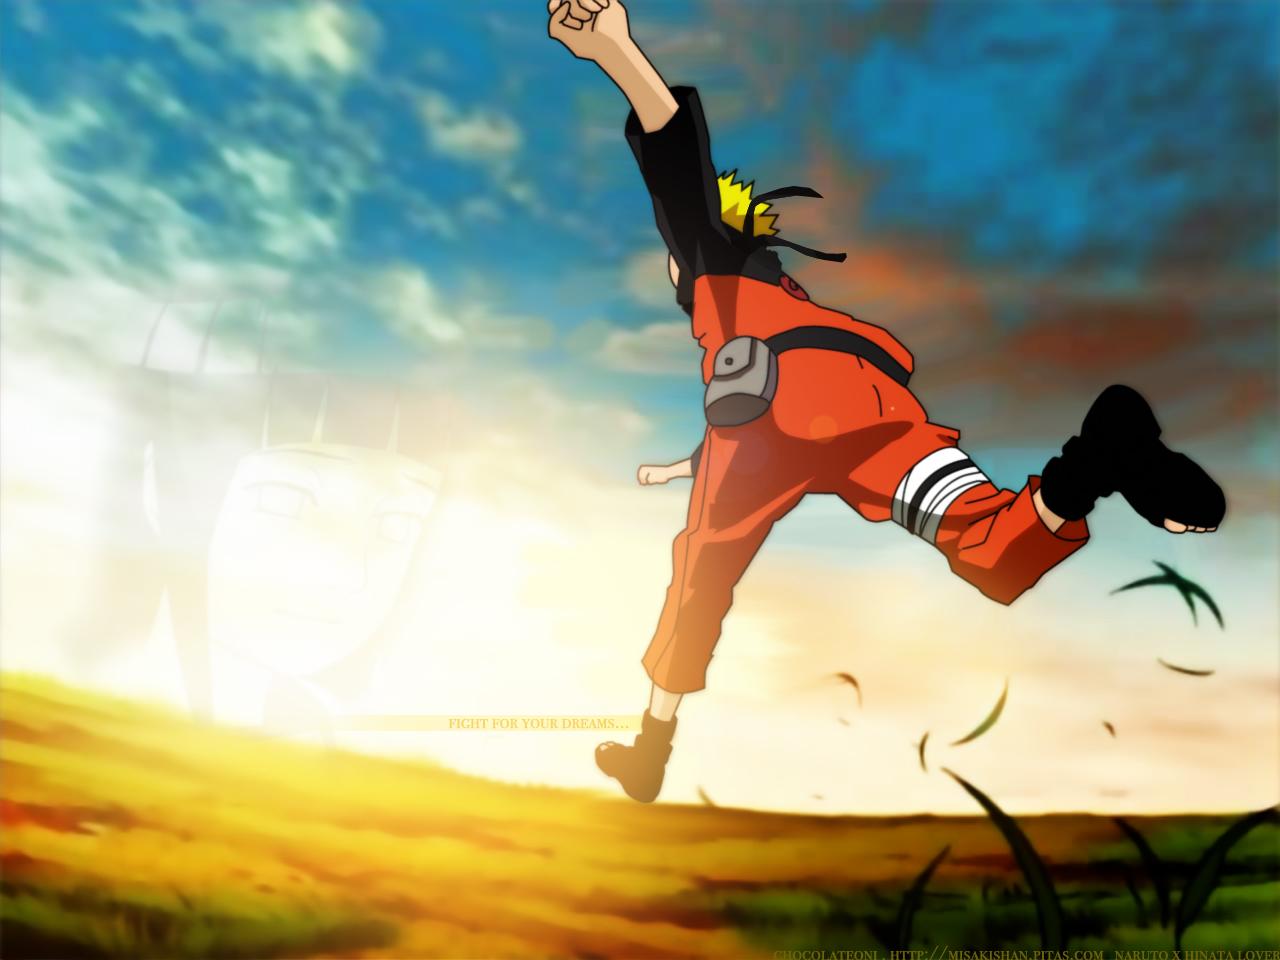 anime images naruto - photo #33